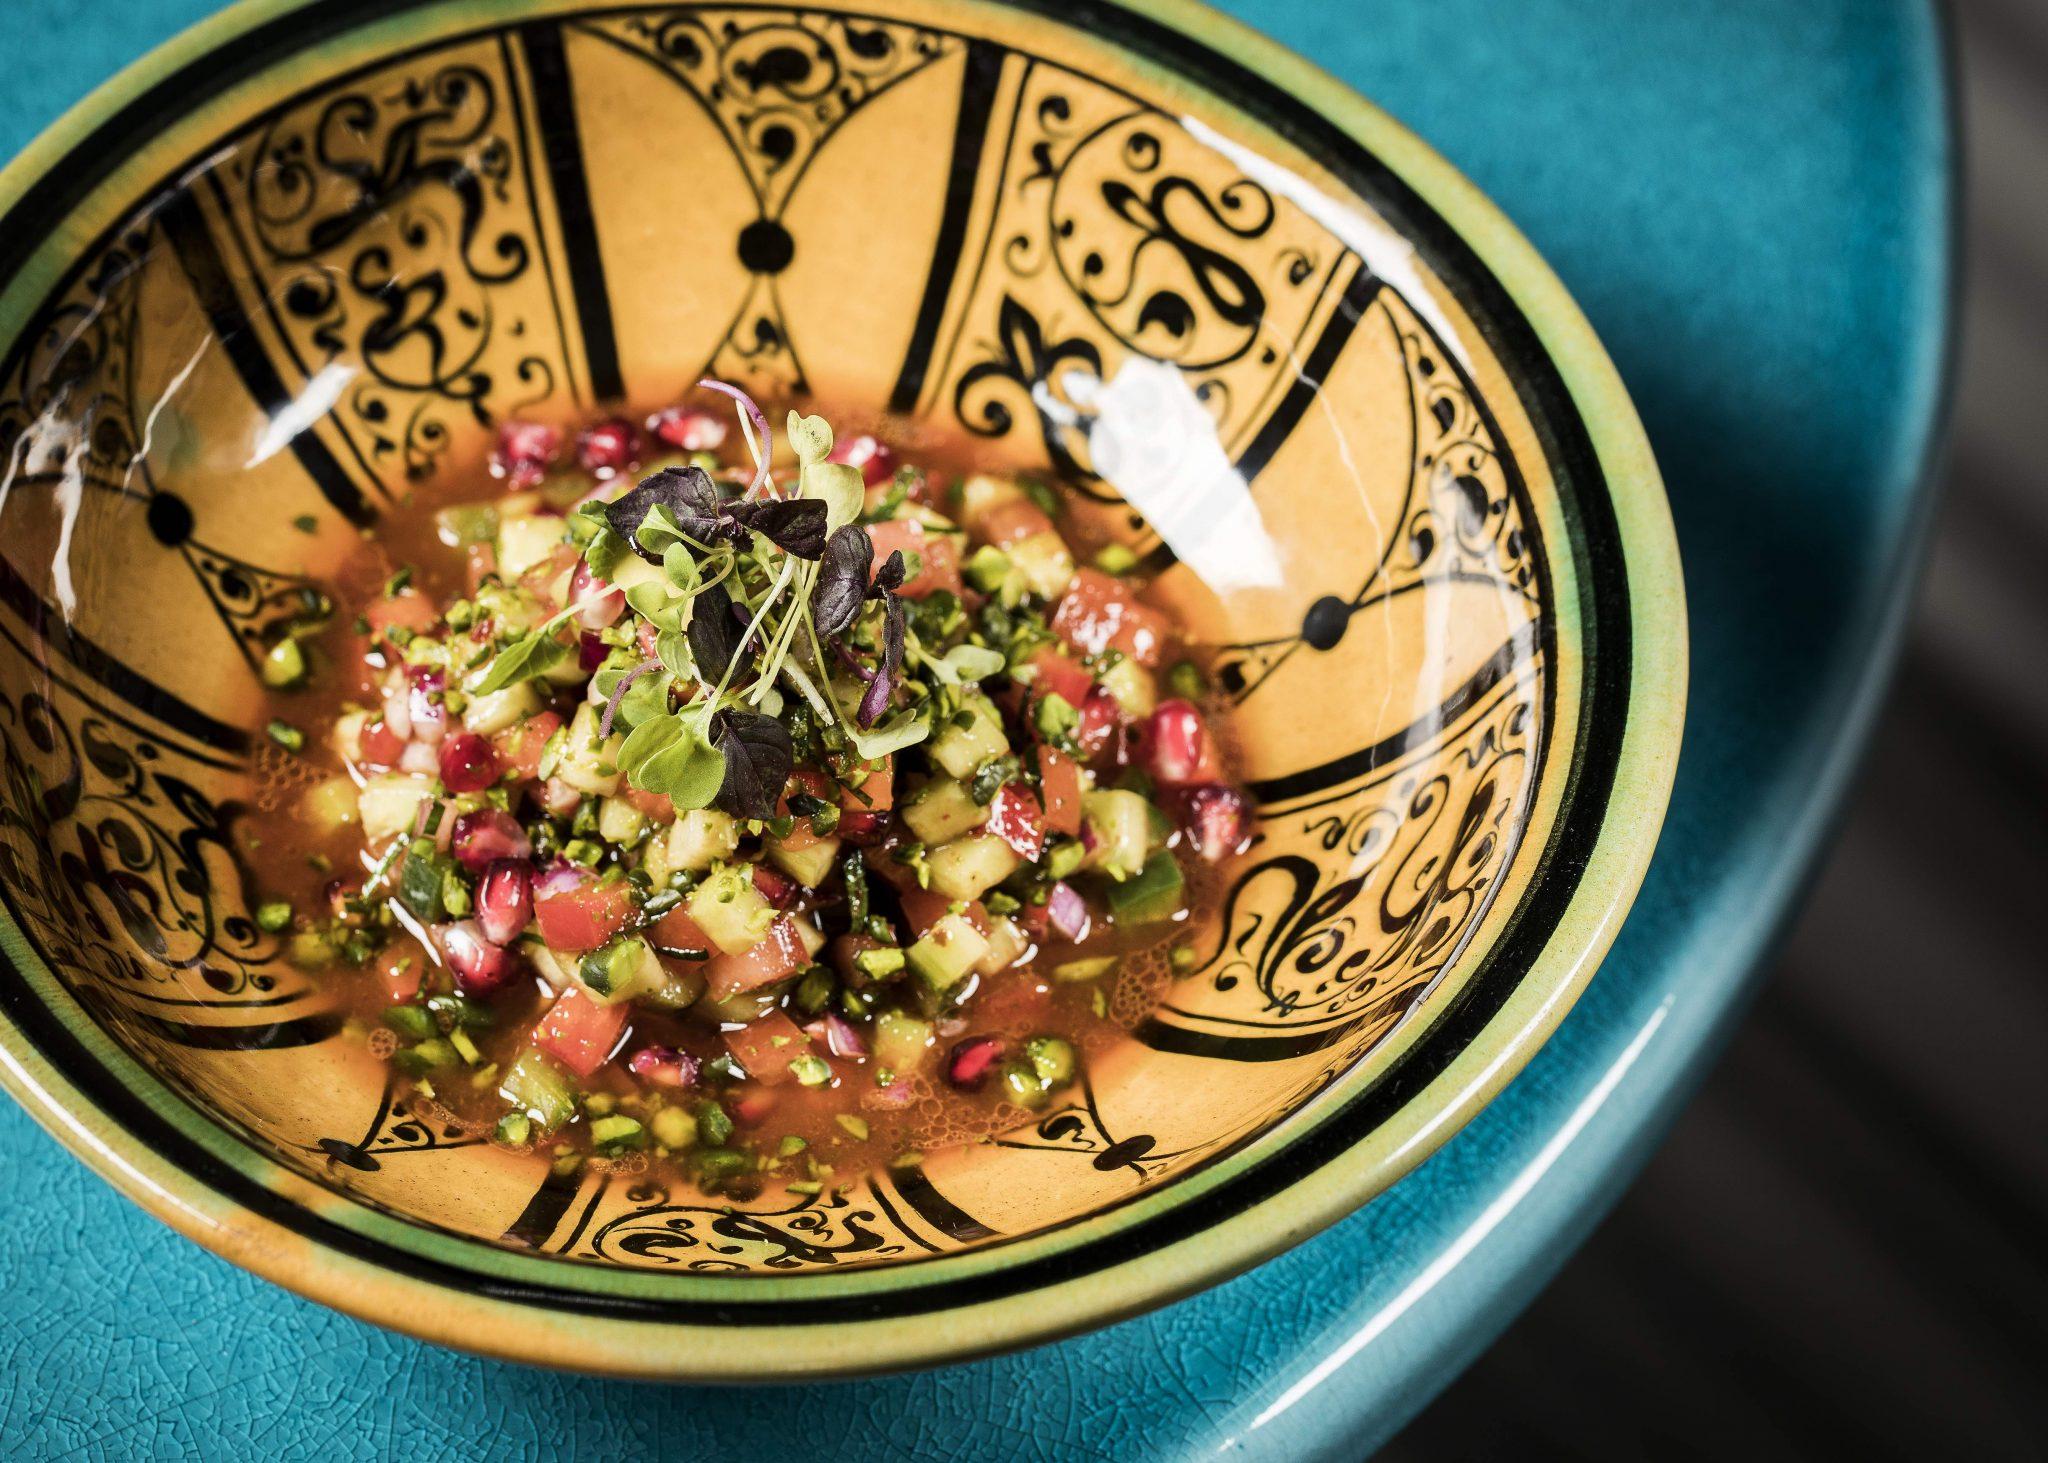 Rüya Turkish Spoon Salad